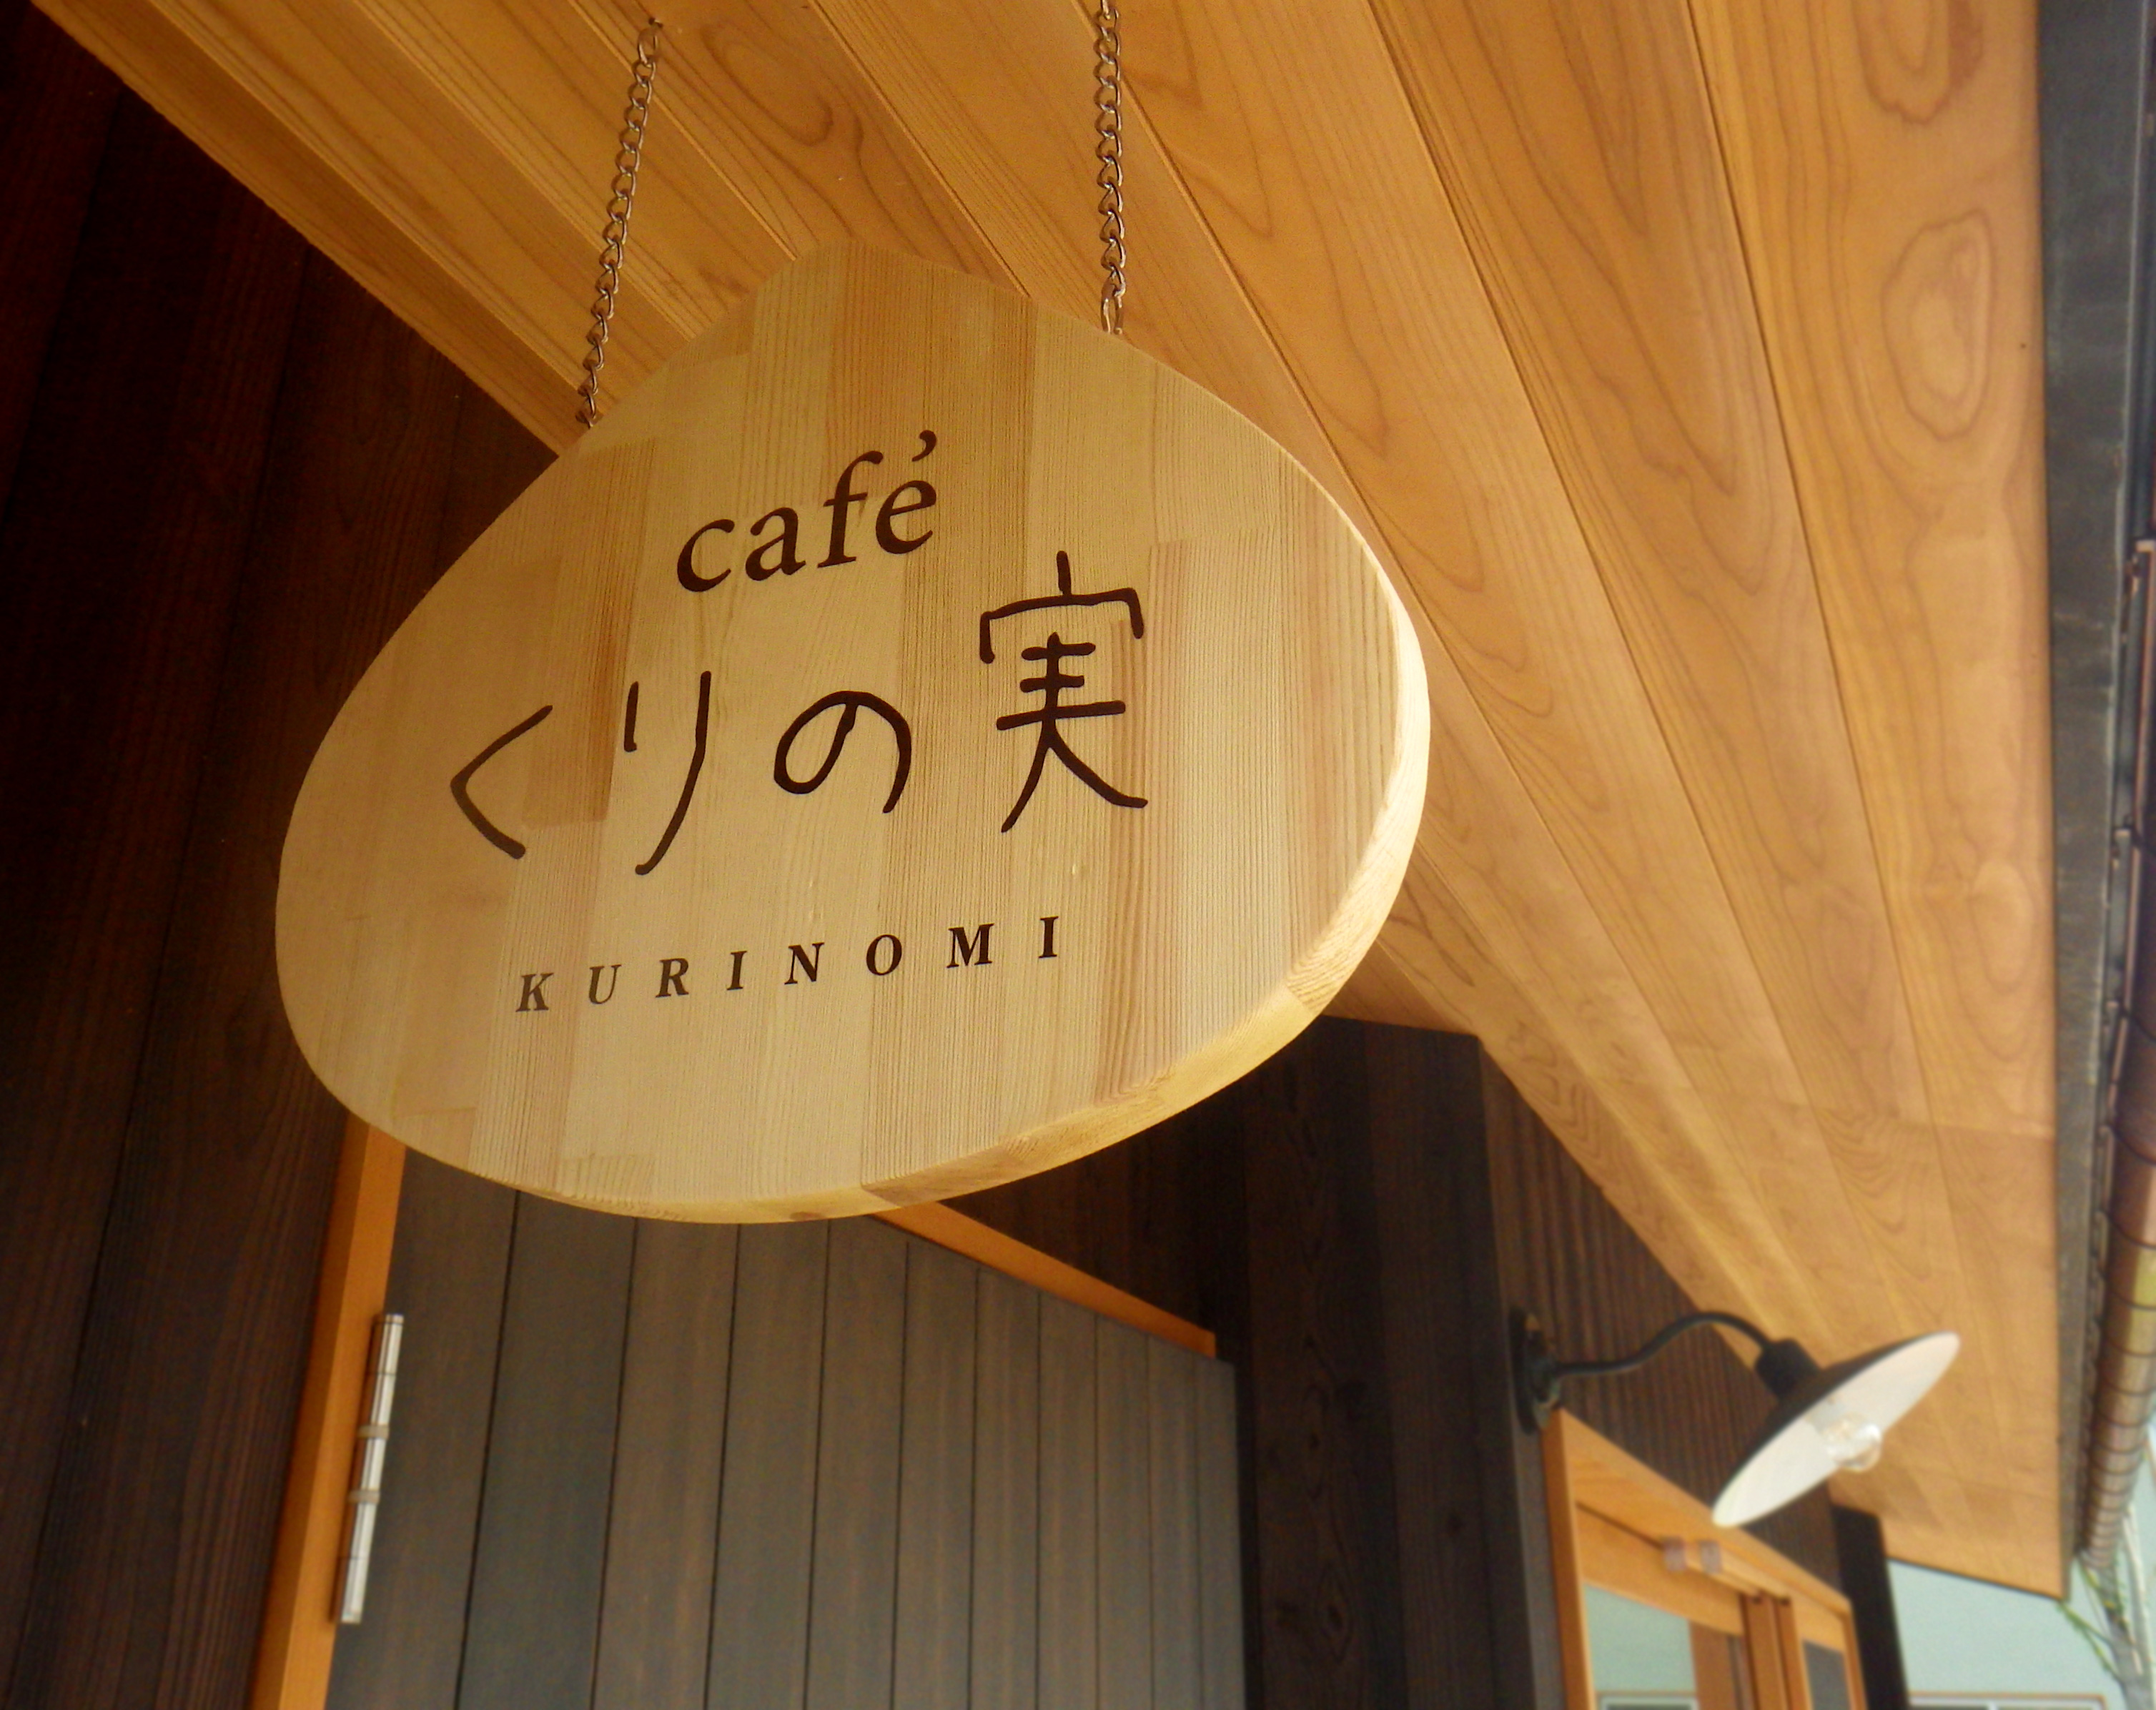 cafeくりの実_2